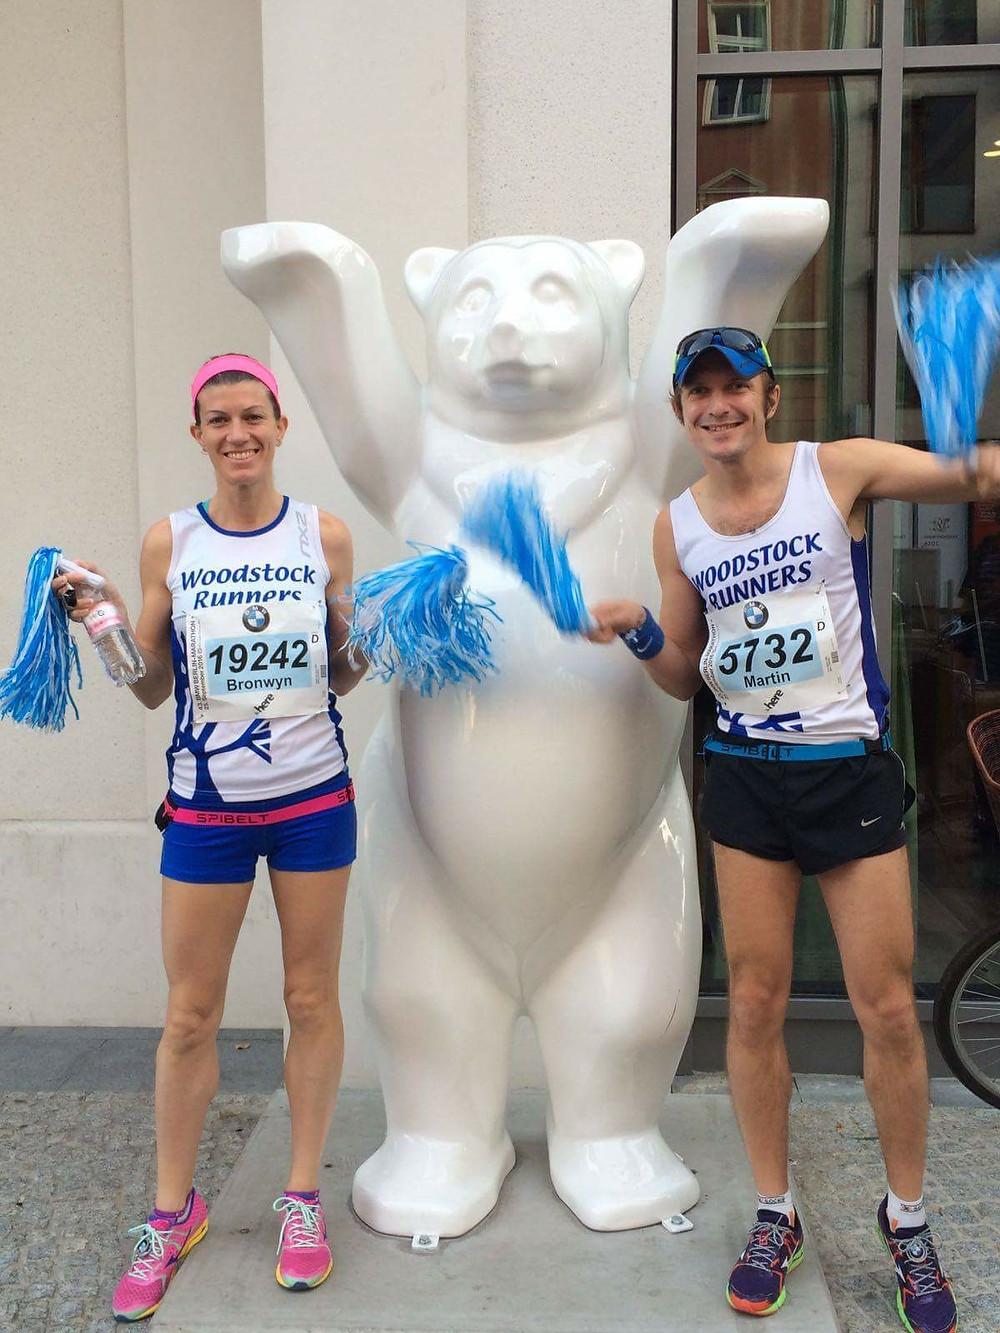 Image of race morning at the 2016 Berlin Marathon